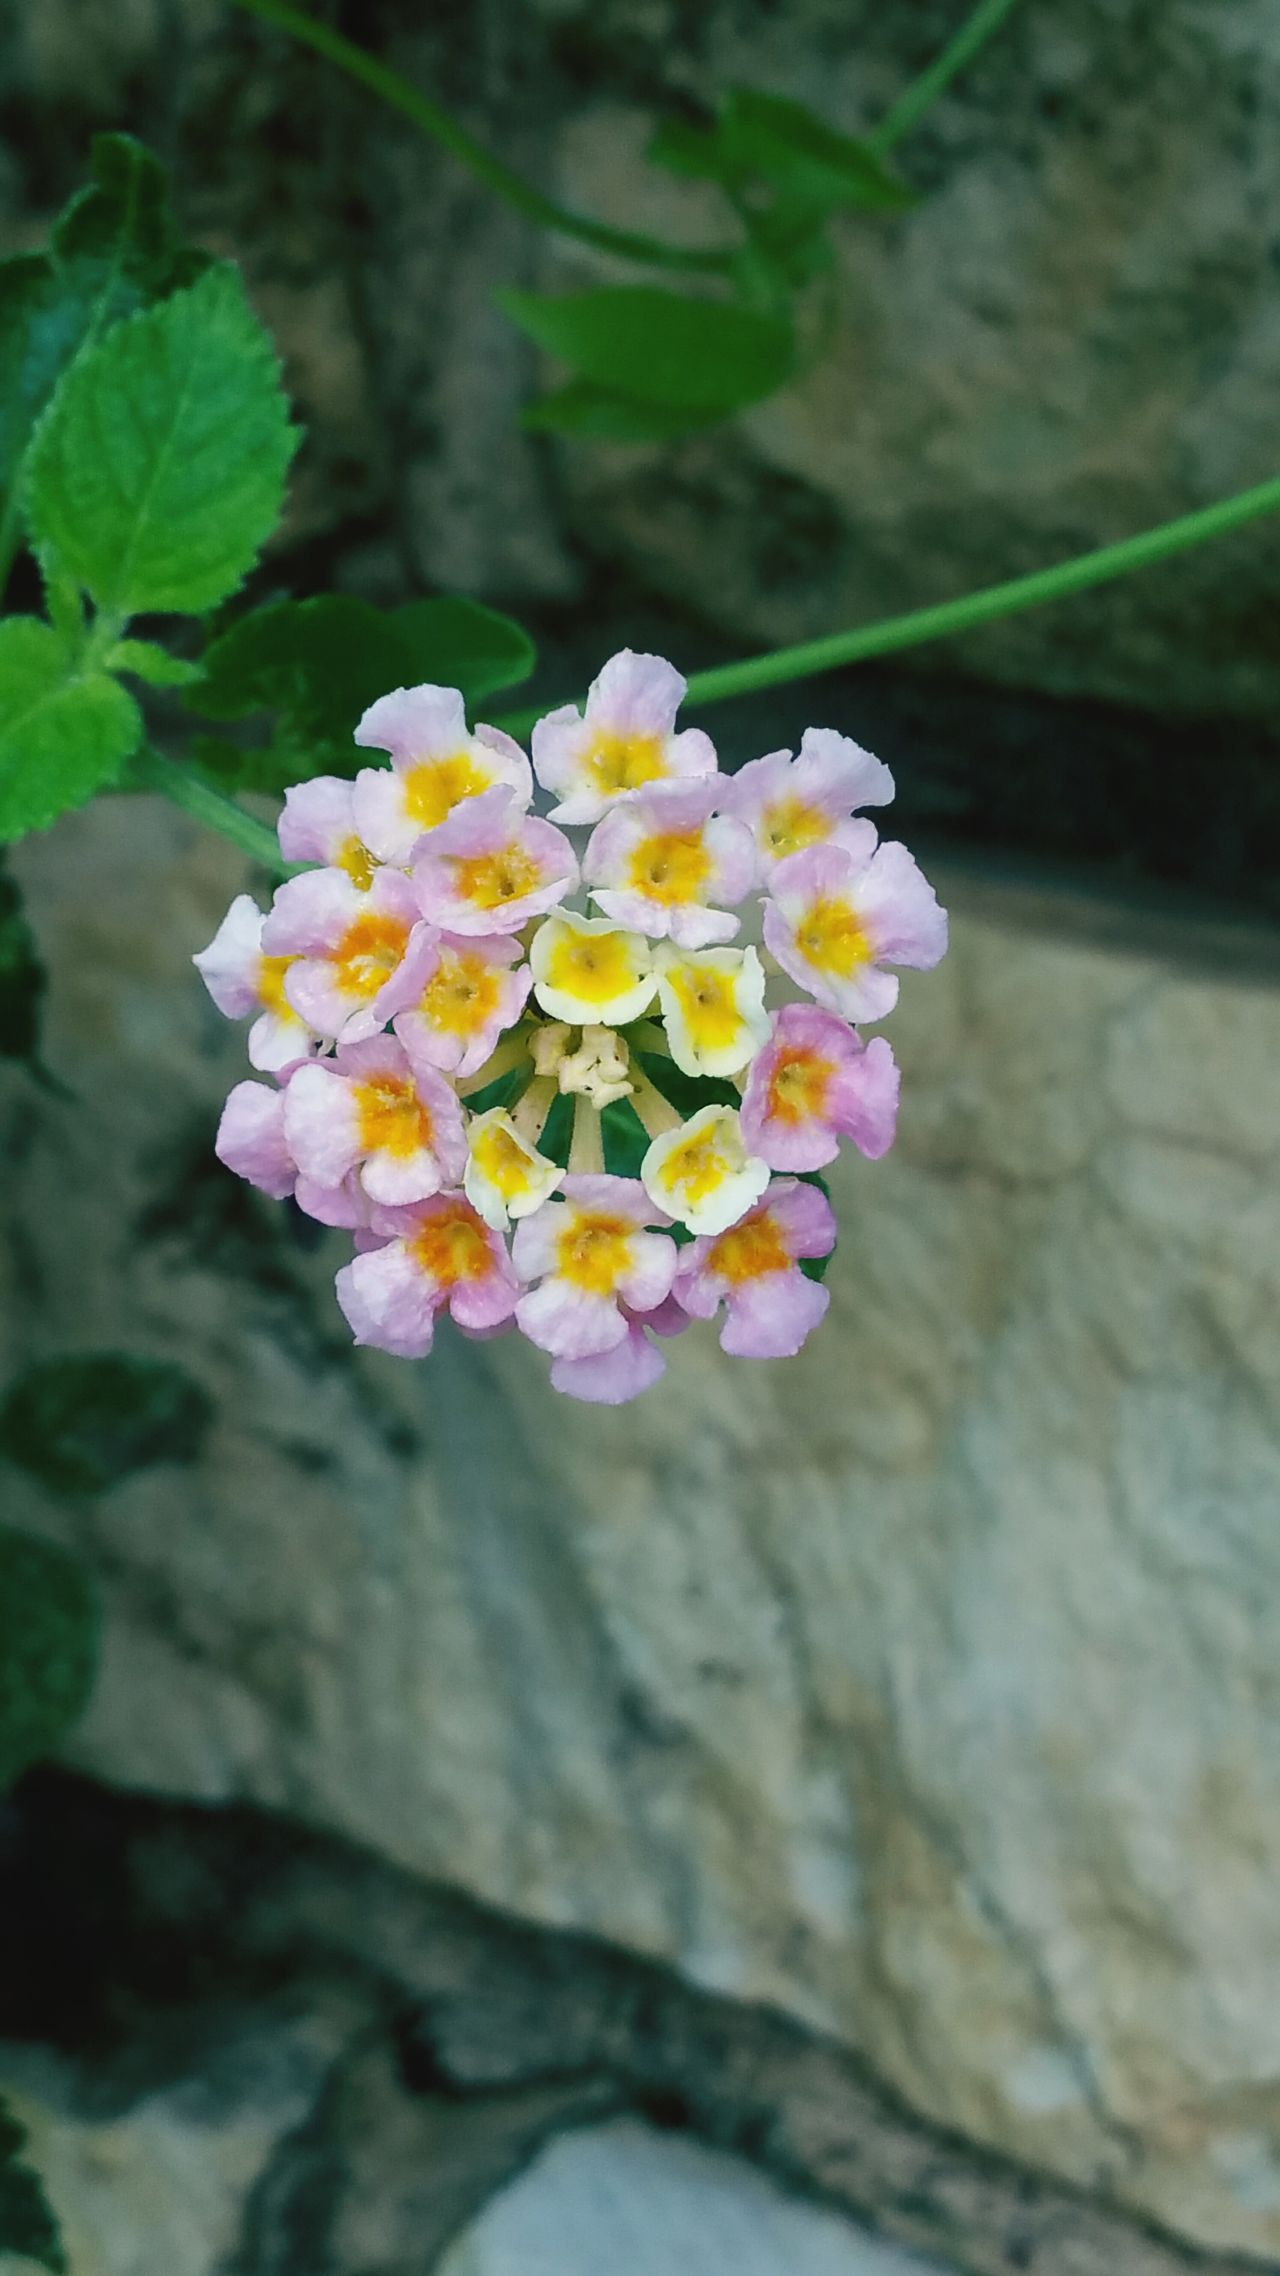 Macro Close-up Colorful Flower Naturelover Nature Flowers Lantana Flower Blurredbackground